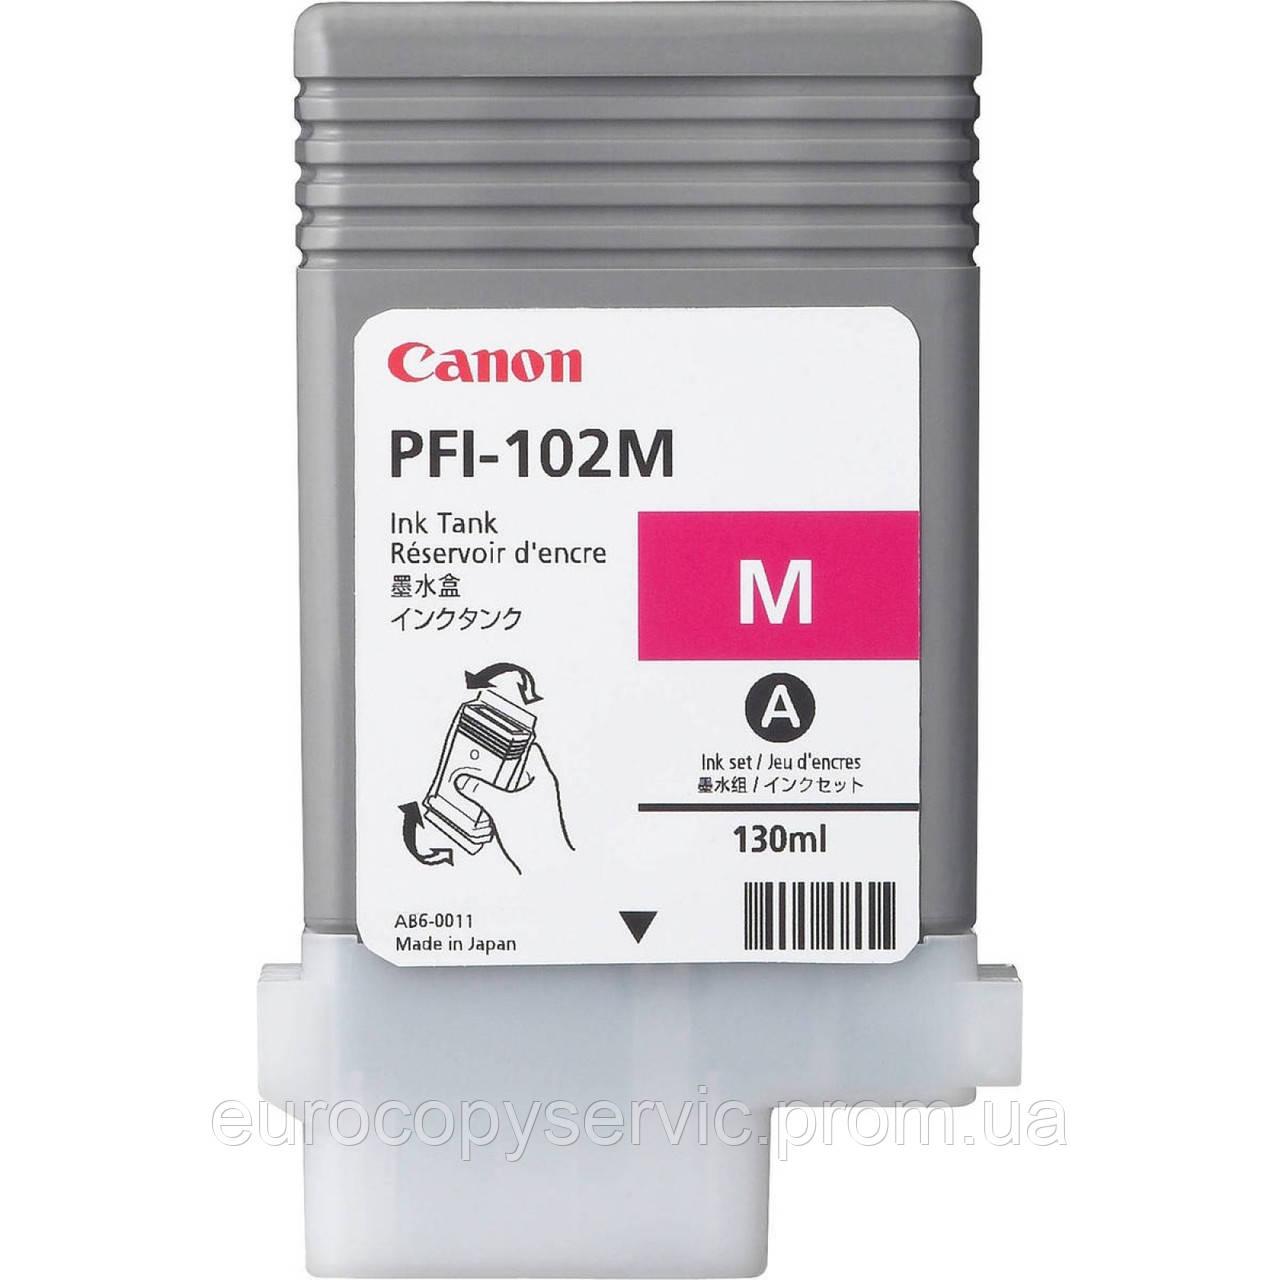 Картридж Canon для Pixma PFI-102M Magenta (0897B001AA) Original